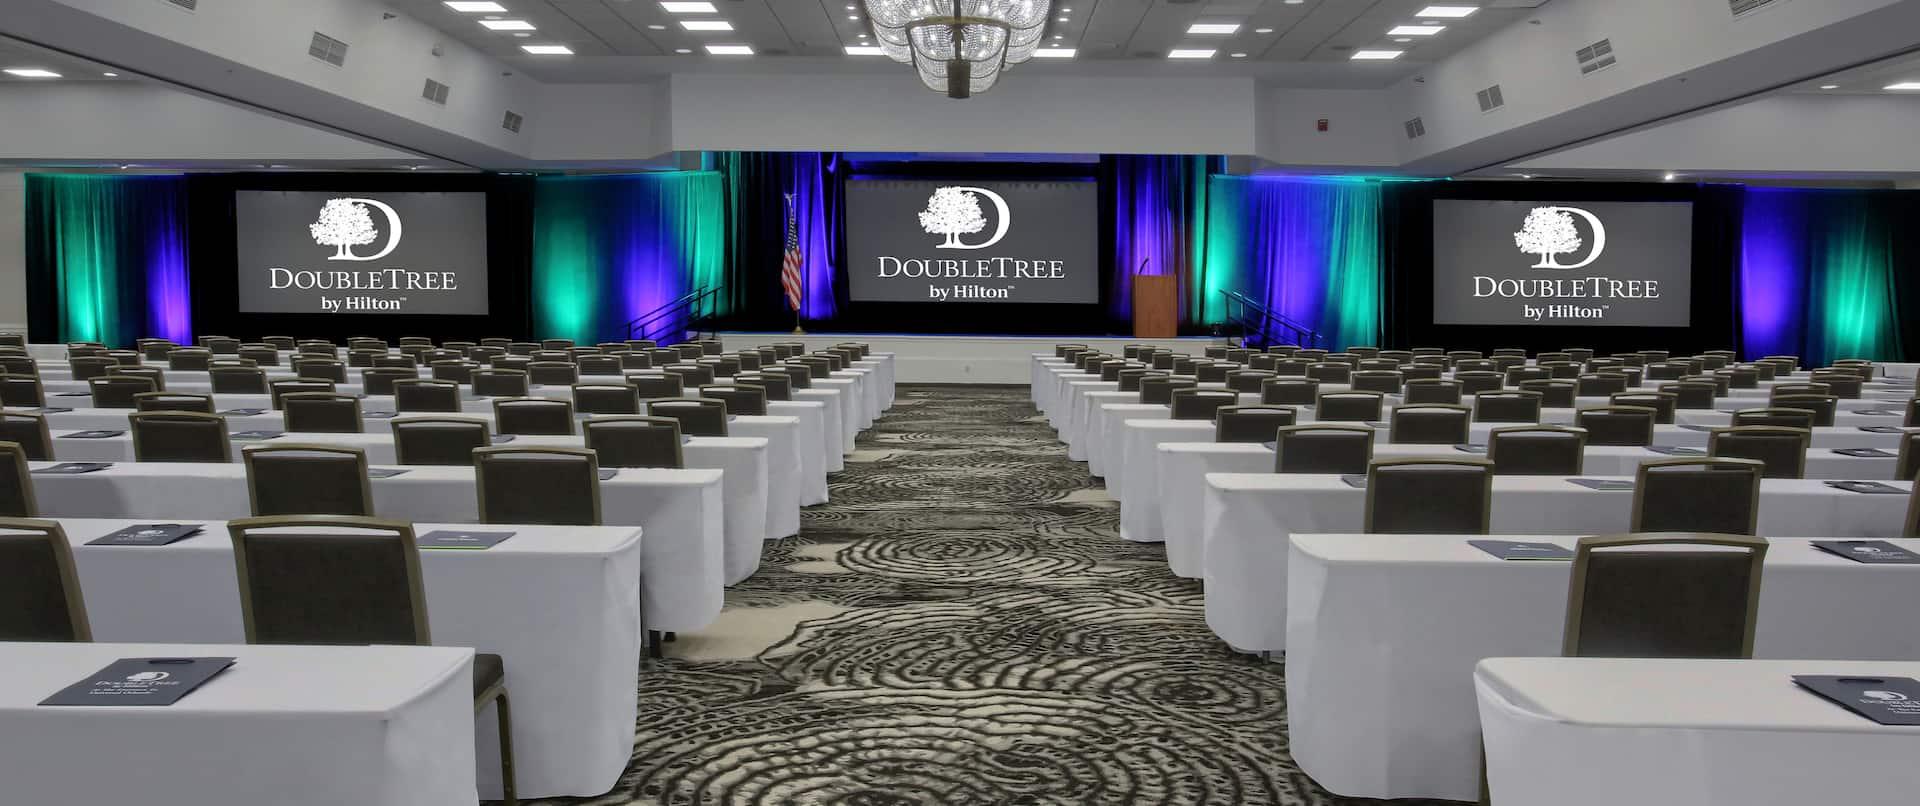 Seminole Ballroom Setup Classroom Style